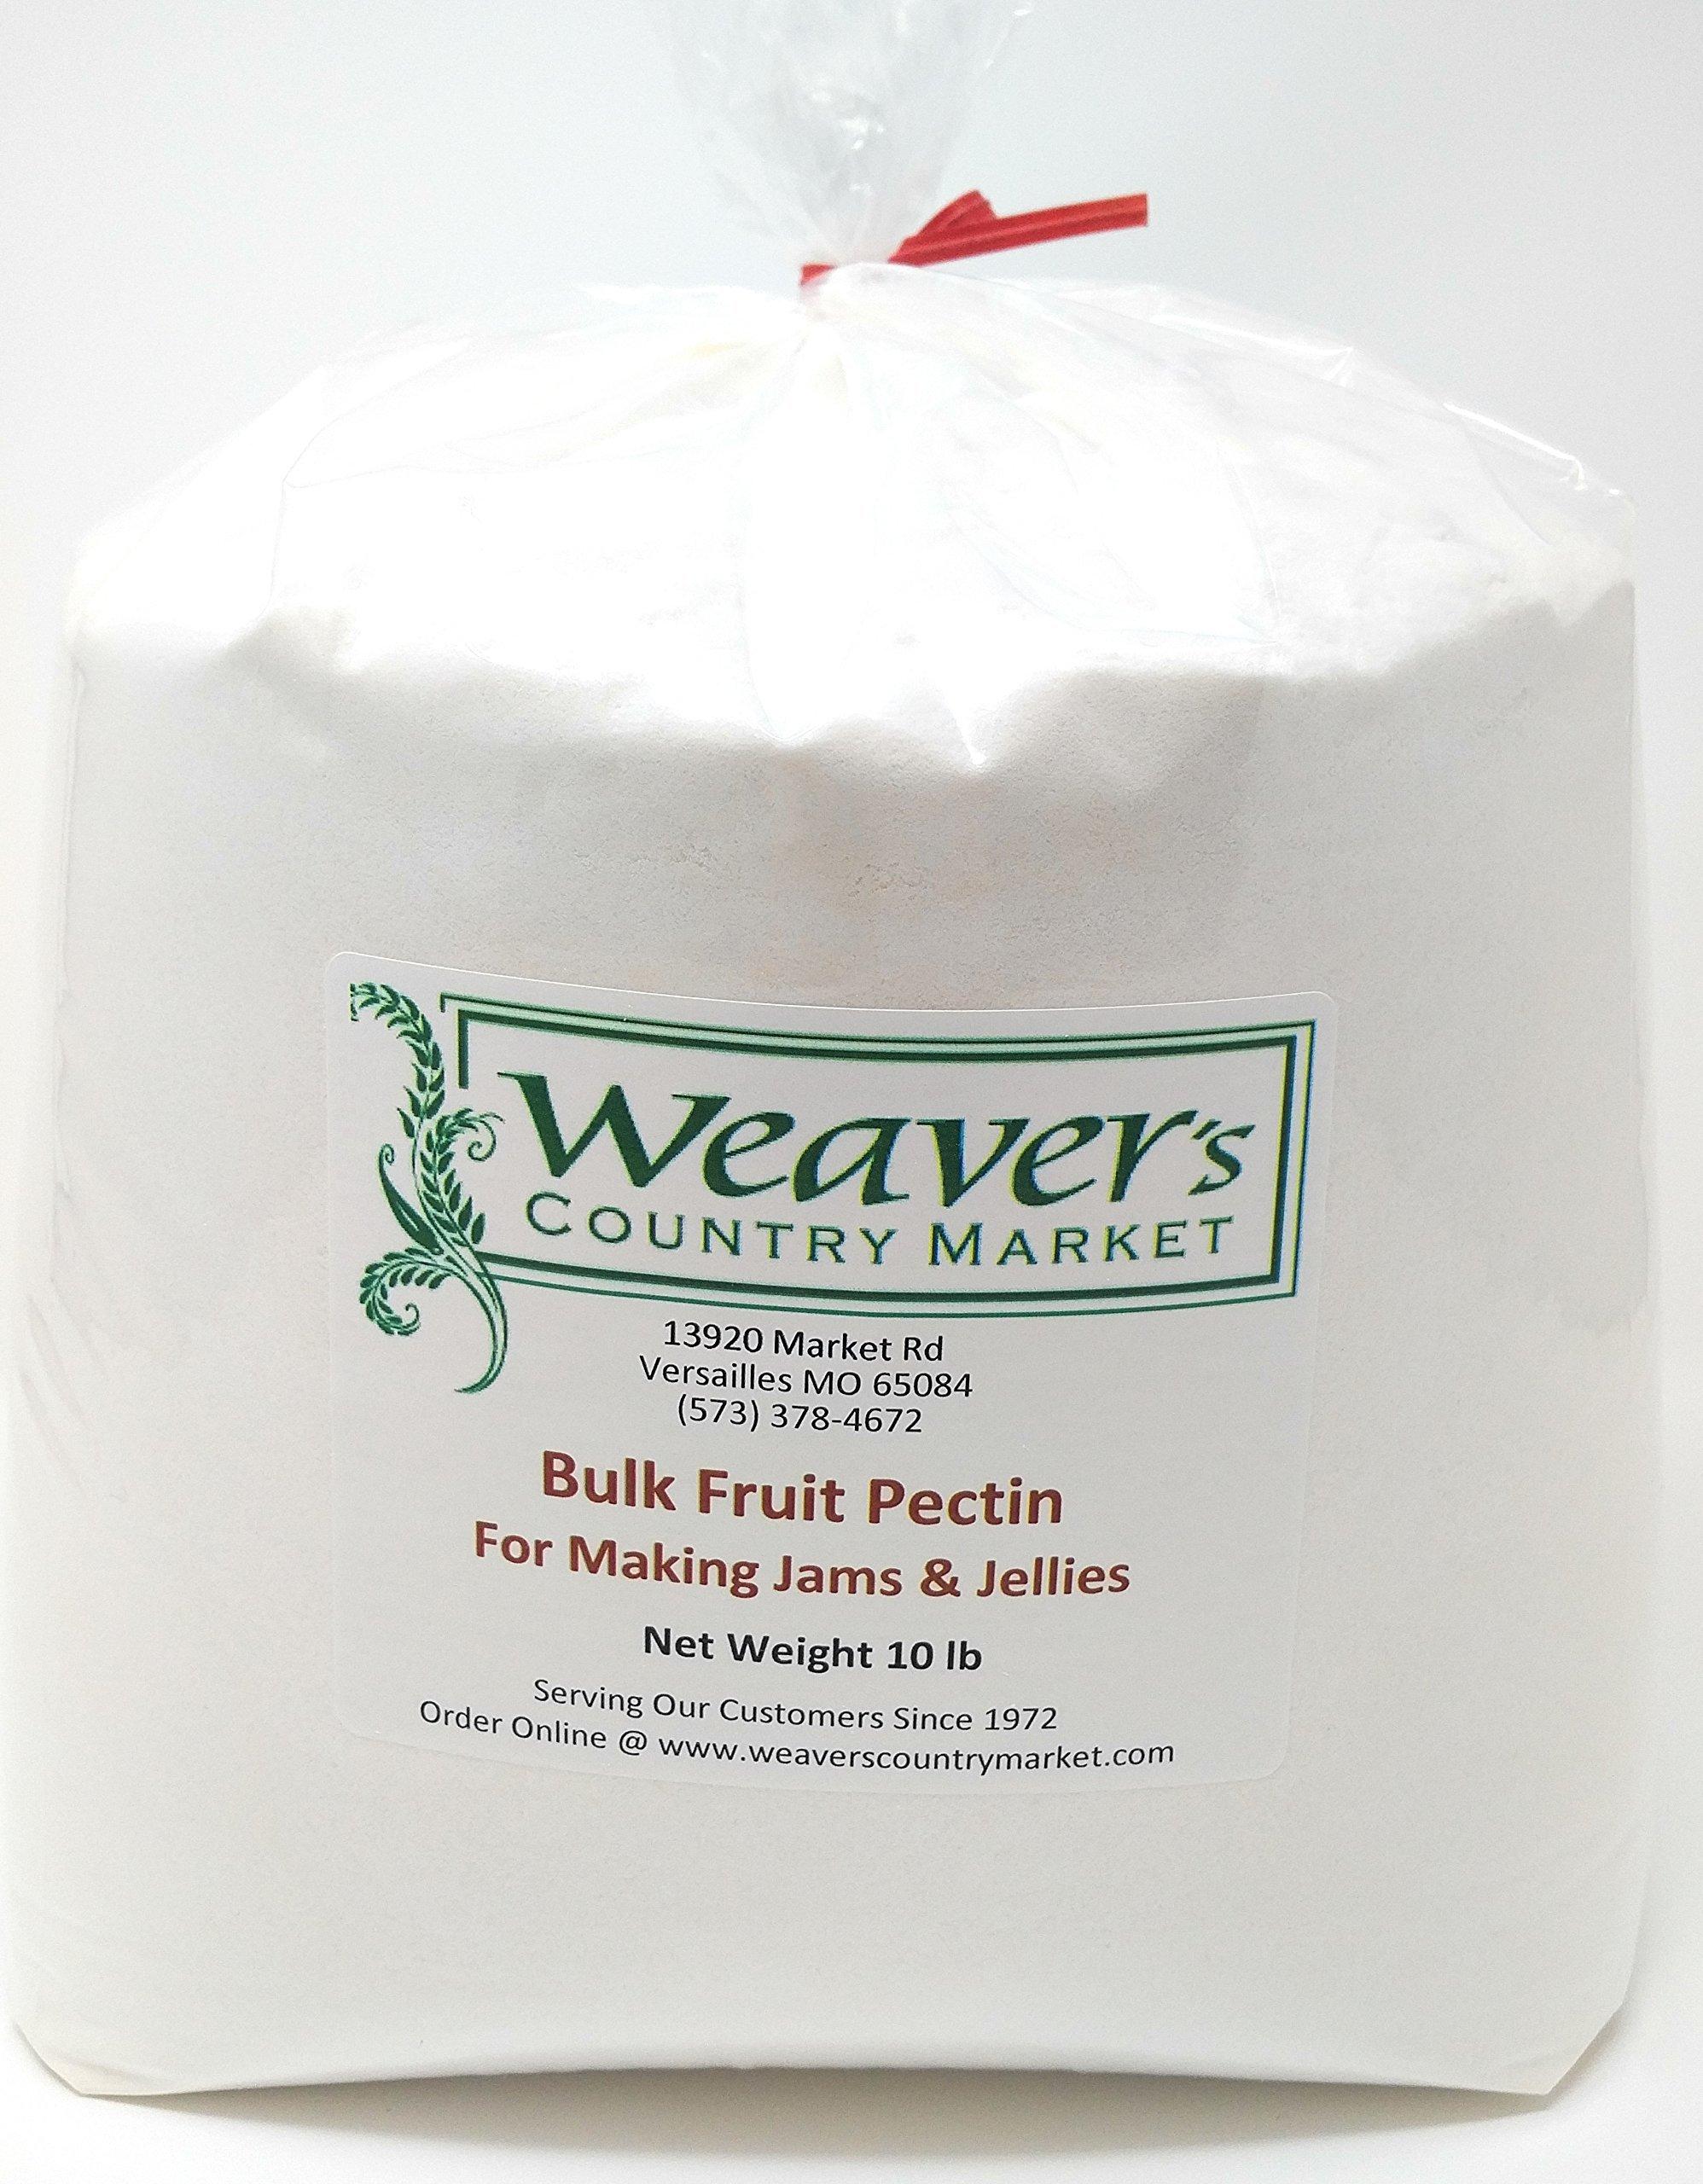 Weaver's Country Market Bulk Fruit Pectin Mix for Making Jams & Jellies (10 Lb. Plastic Bag) by Weaver's Country Market